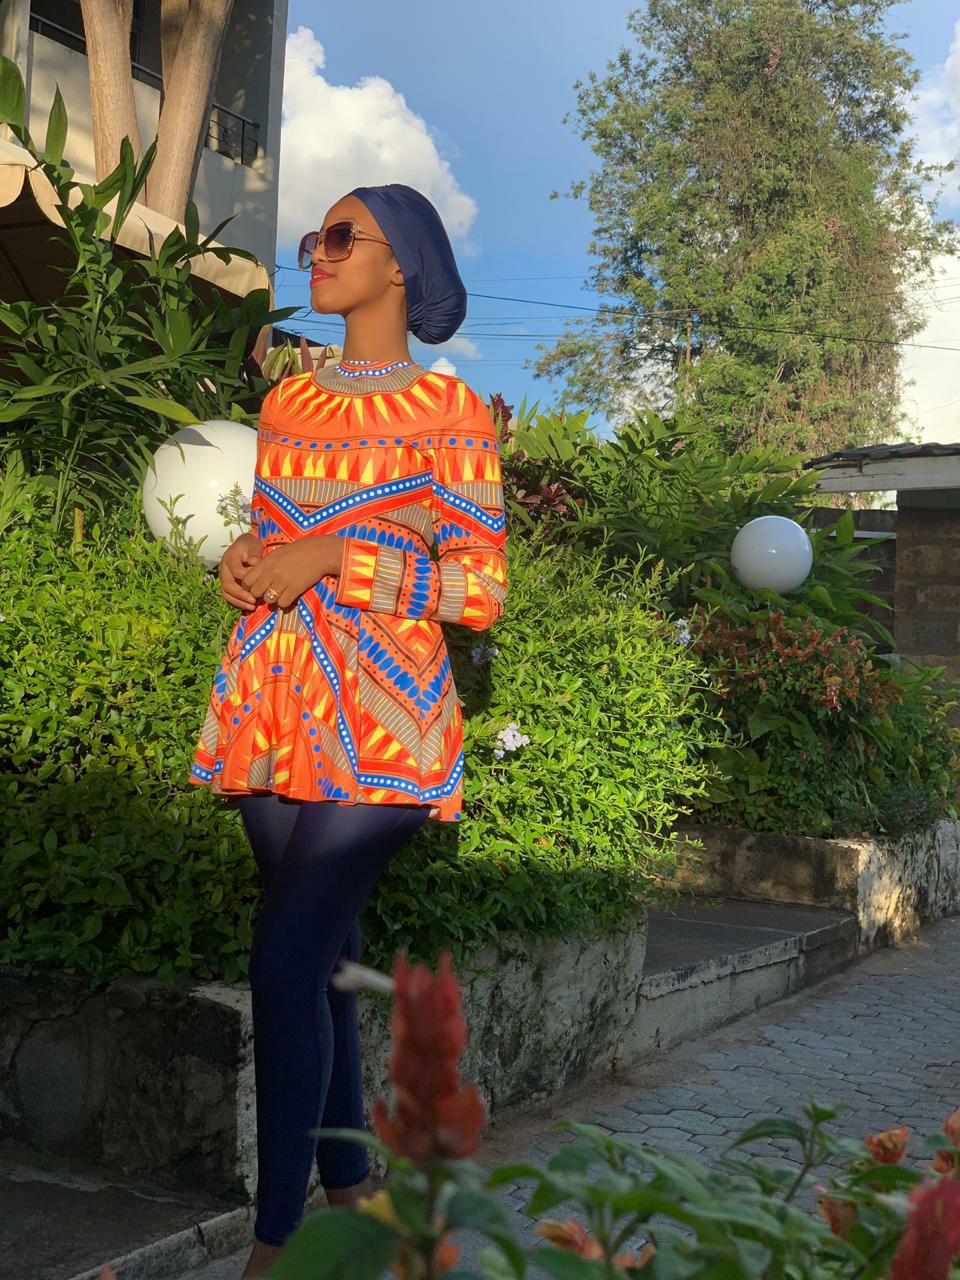 Burkini wear